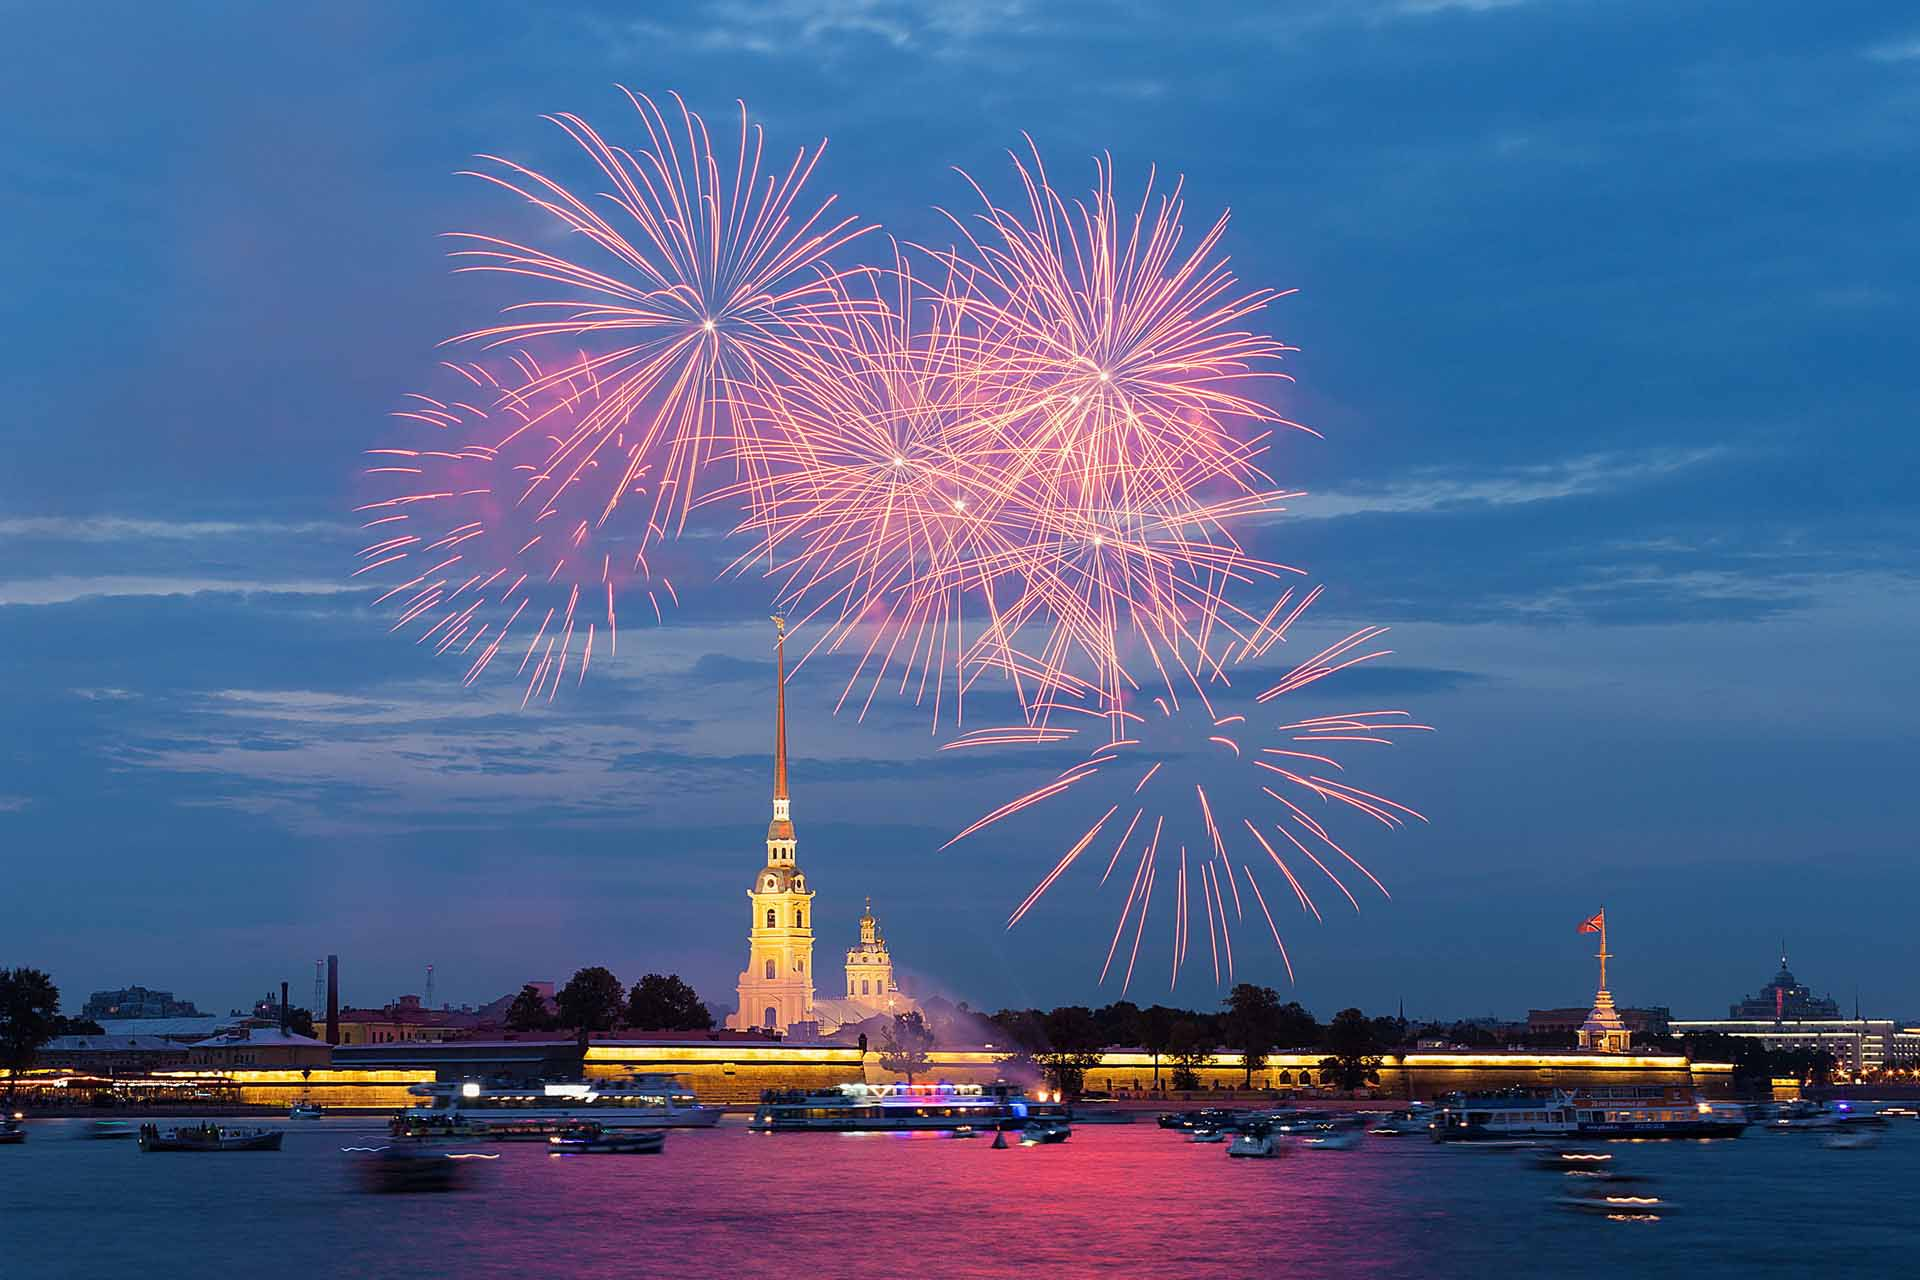 Картинки с днем города санкт-петербурга